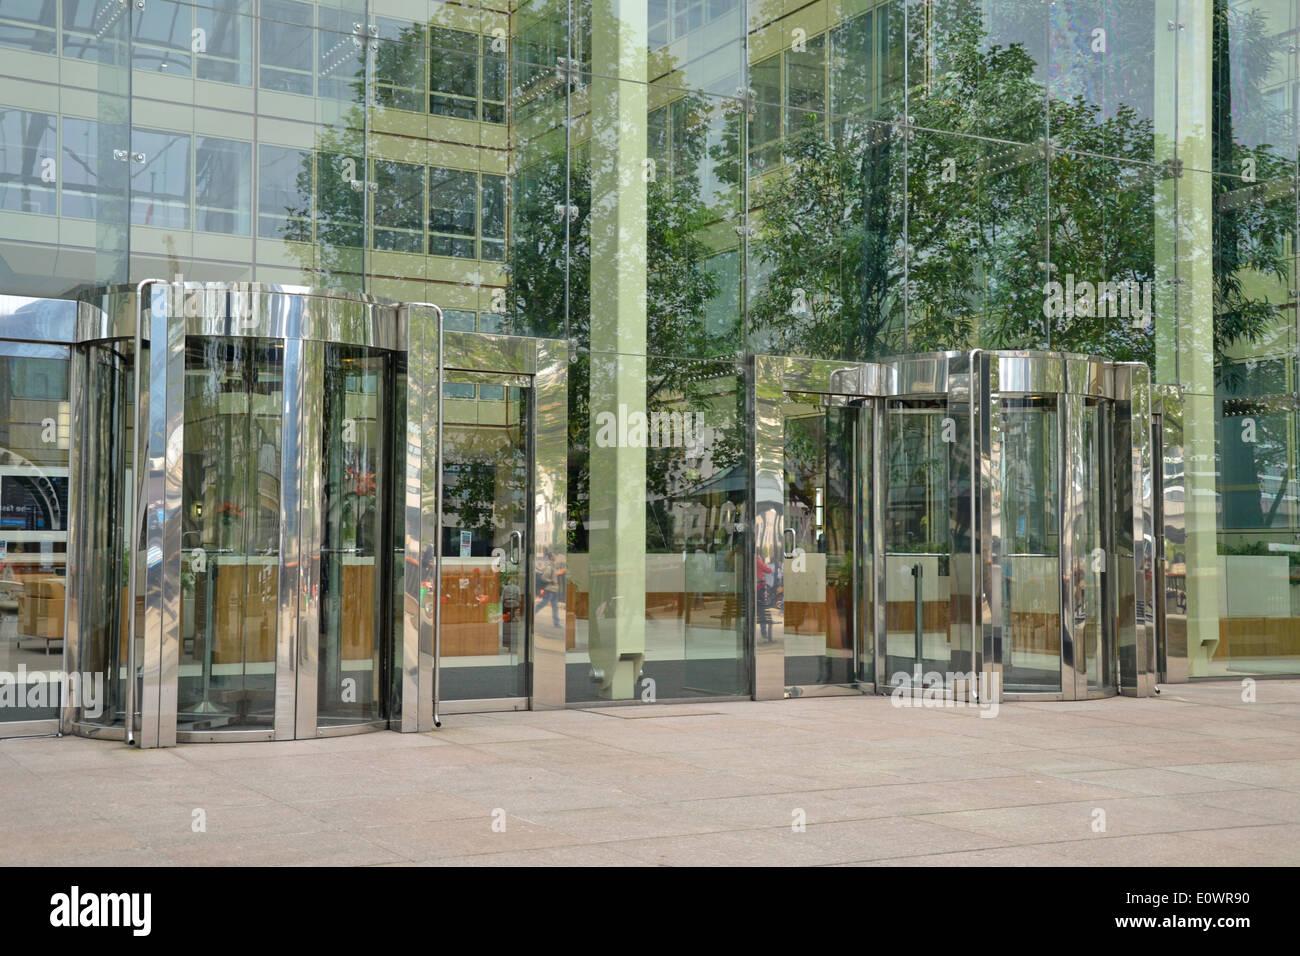 Entrance to modern office block via glass revolving doors stock entrance to modern office block via glass revolving doors planetlyrics Image collections